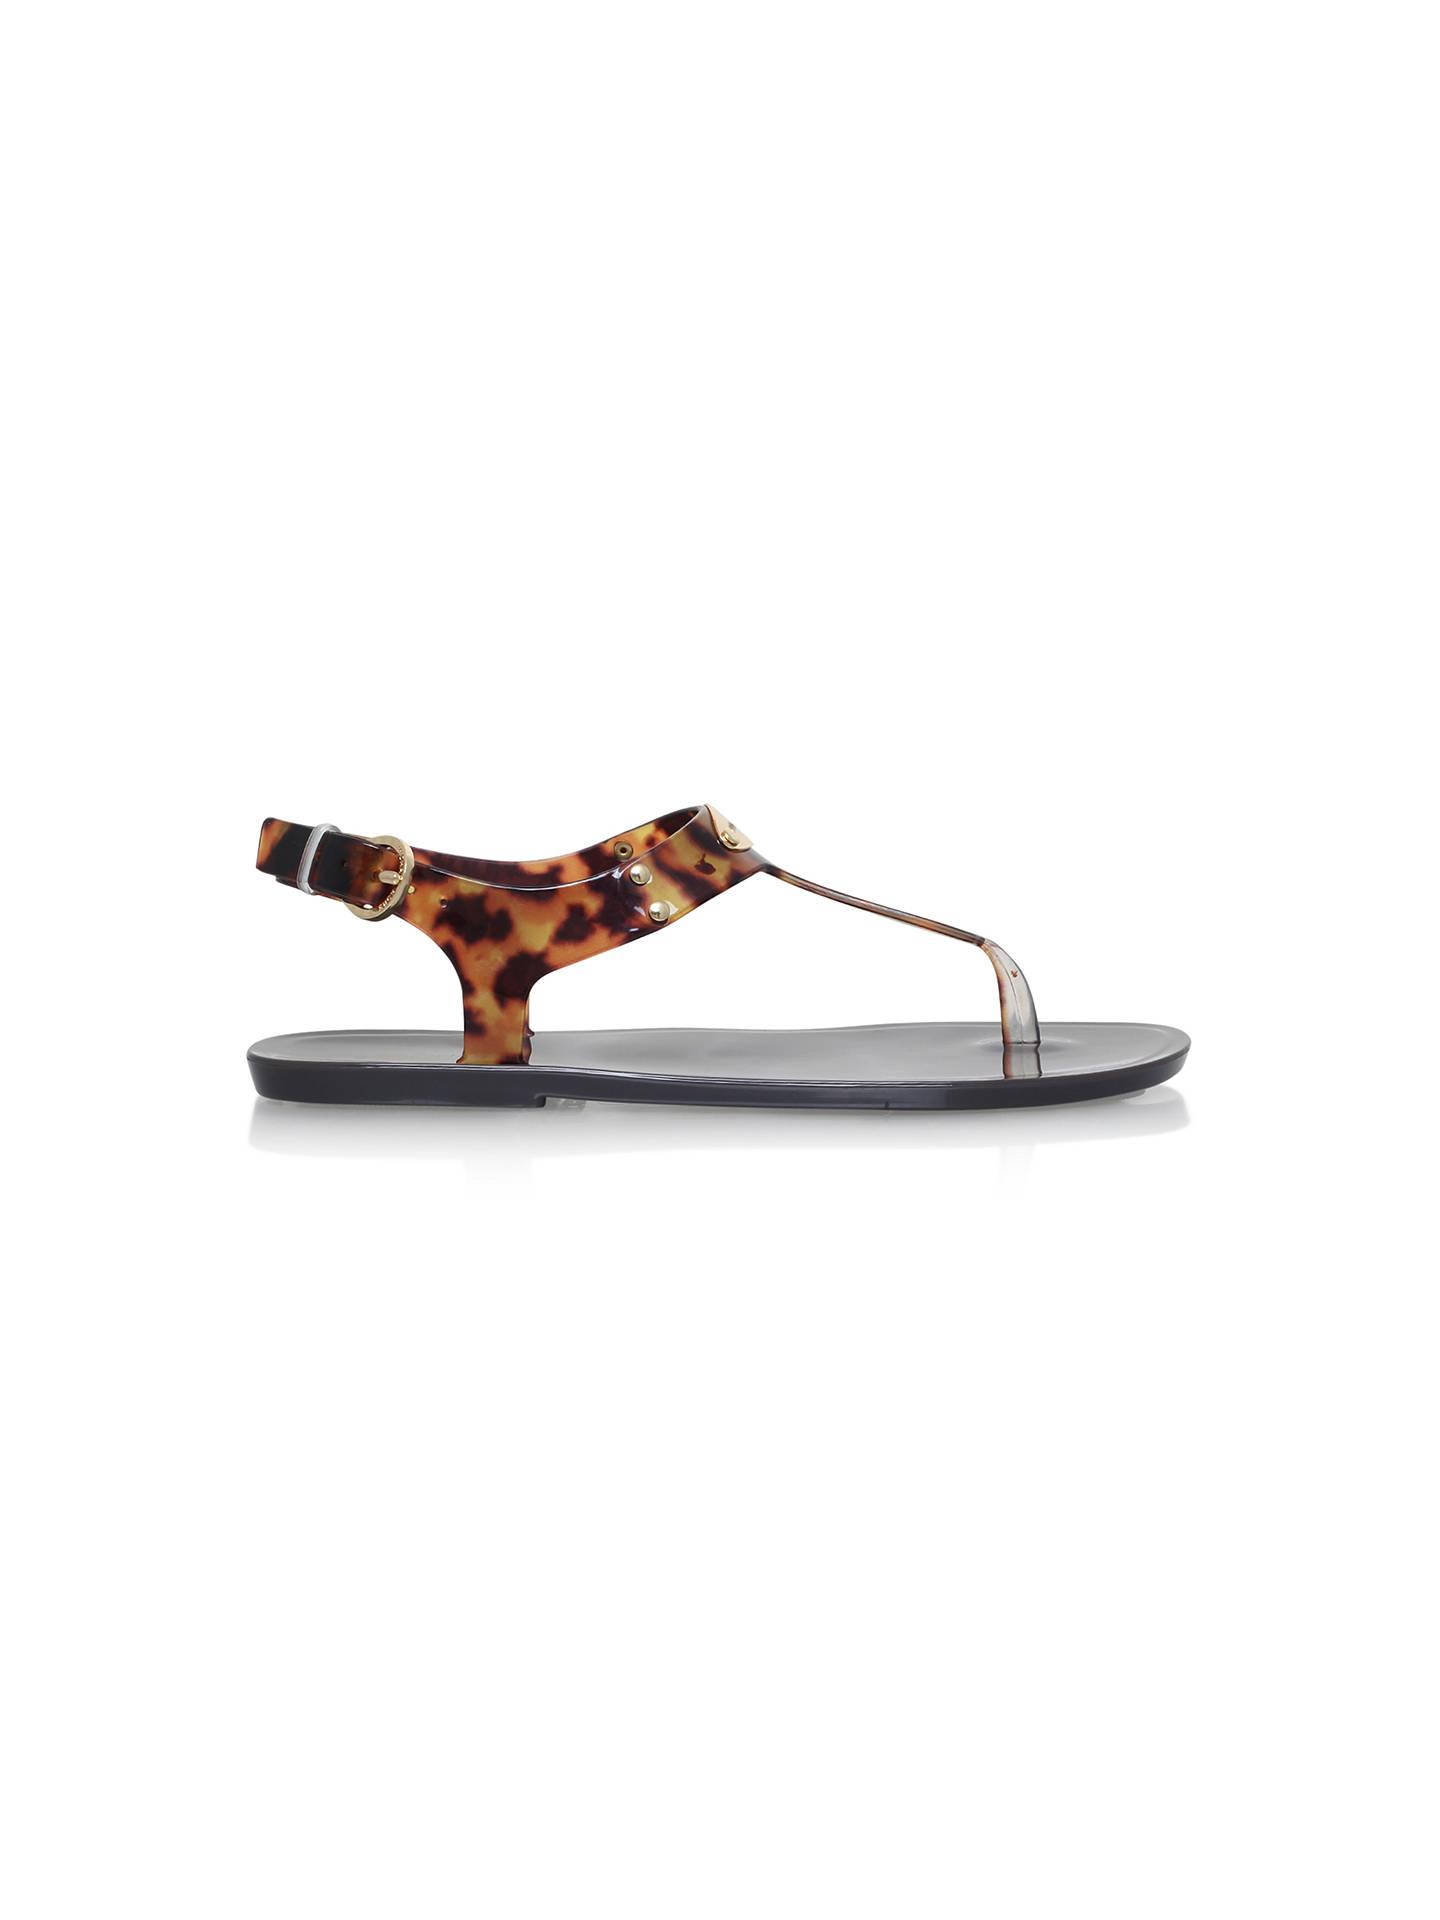 5e0424f8be89 ... Buy MICHAEL Michael Kors MK Plate Jelly Sandals